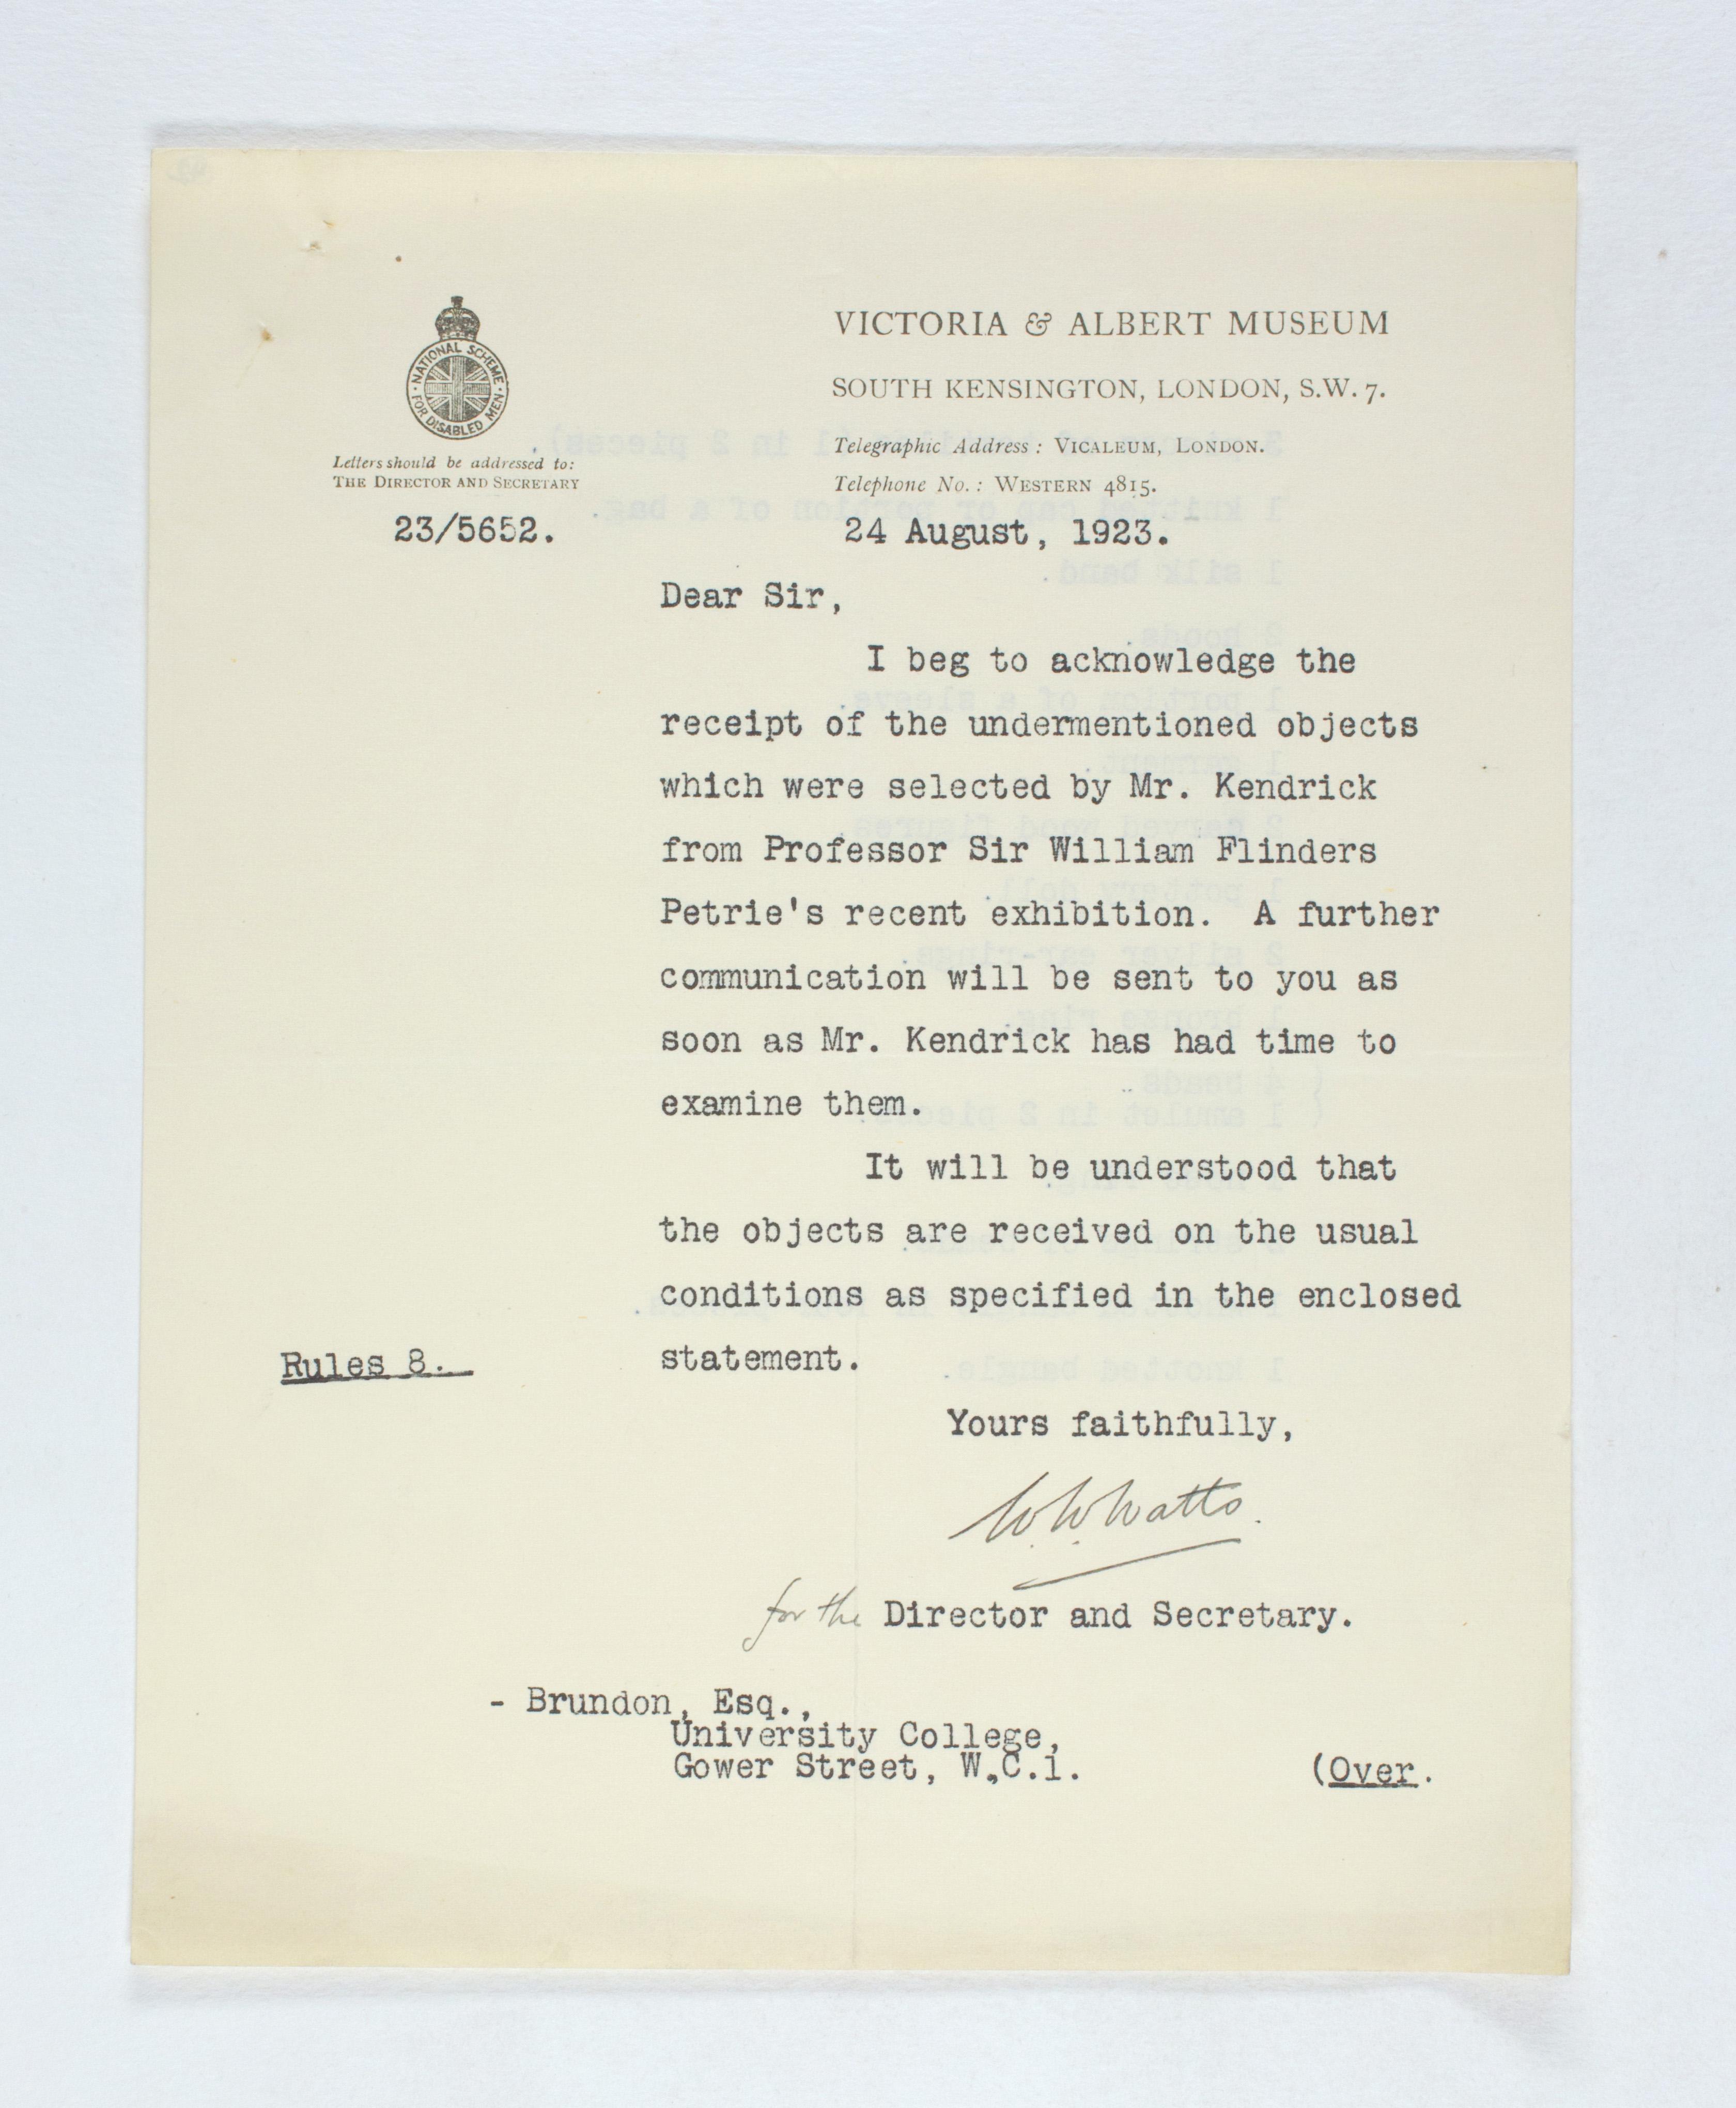 1922-23 Qau el-Kebir Receipt from institution  PMA/WFP1/D/26/42.1